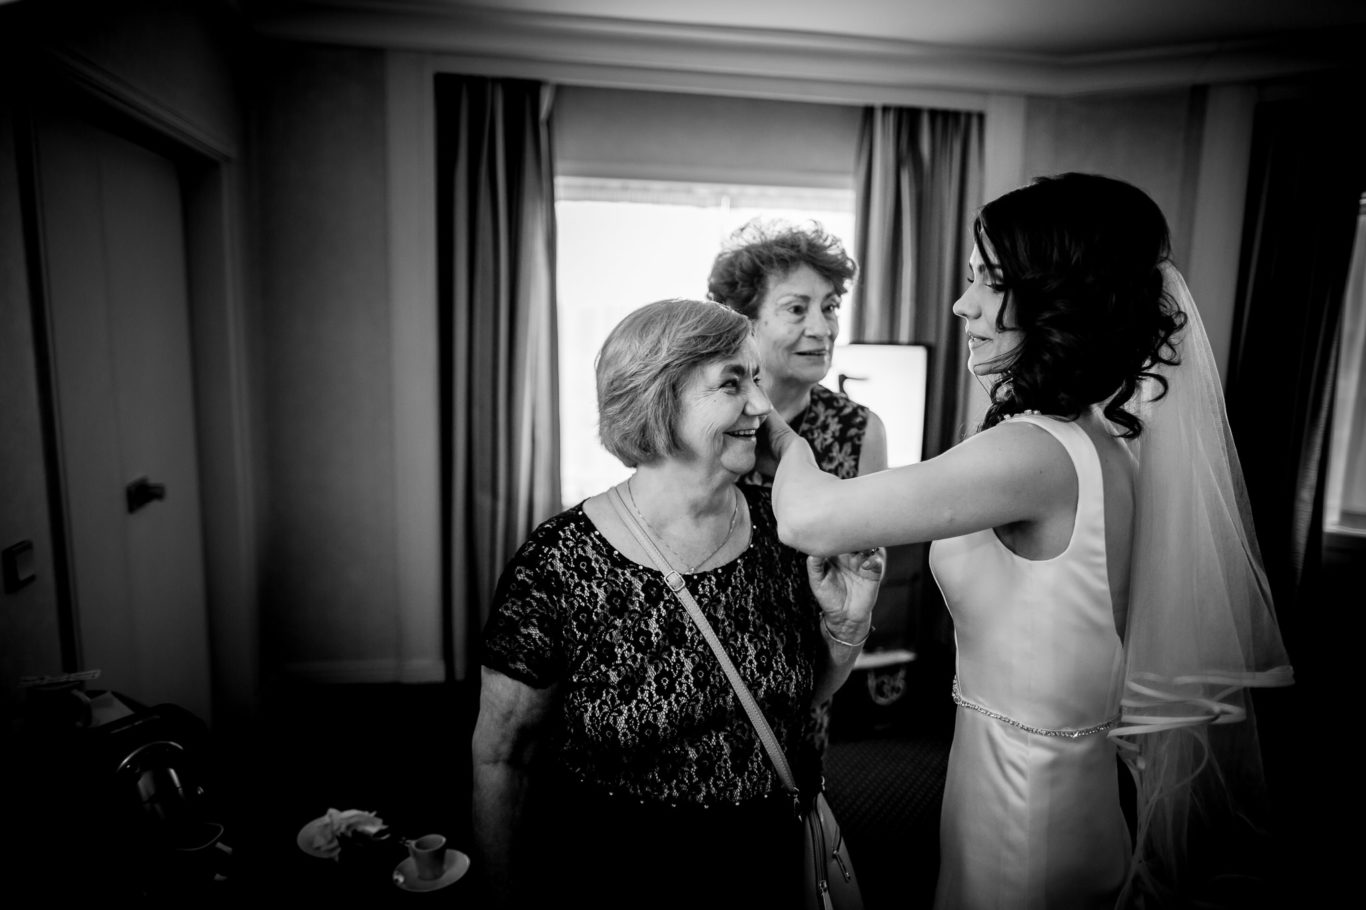 0260-fotografie-nunta-bucuresti-dana-radu-fotograf-ciprian-dumitrescu-dc1_3882